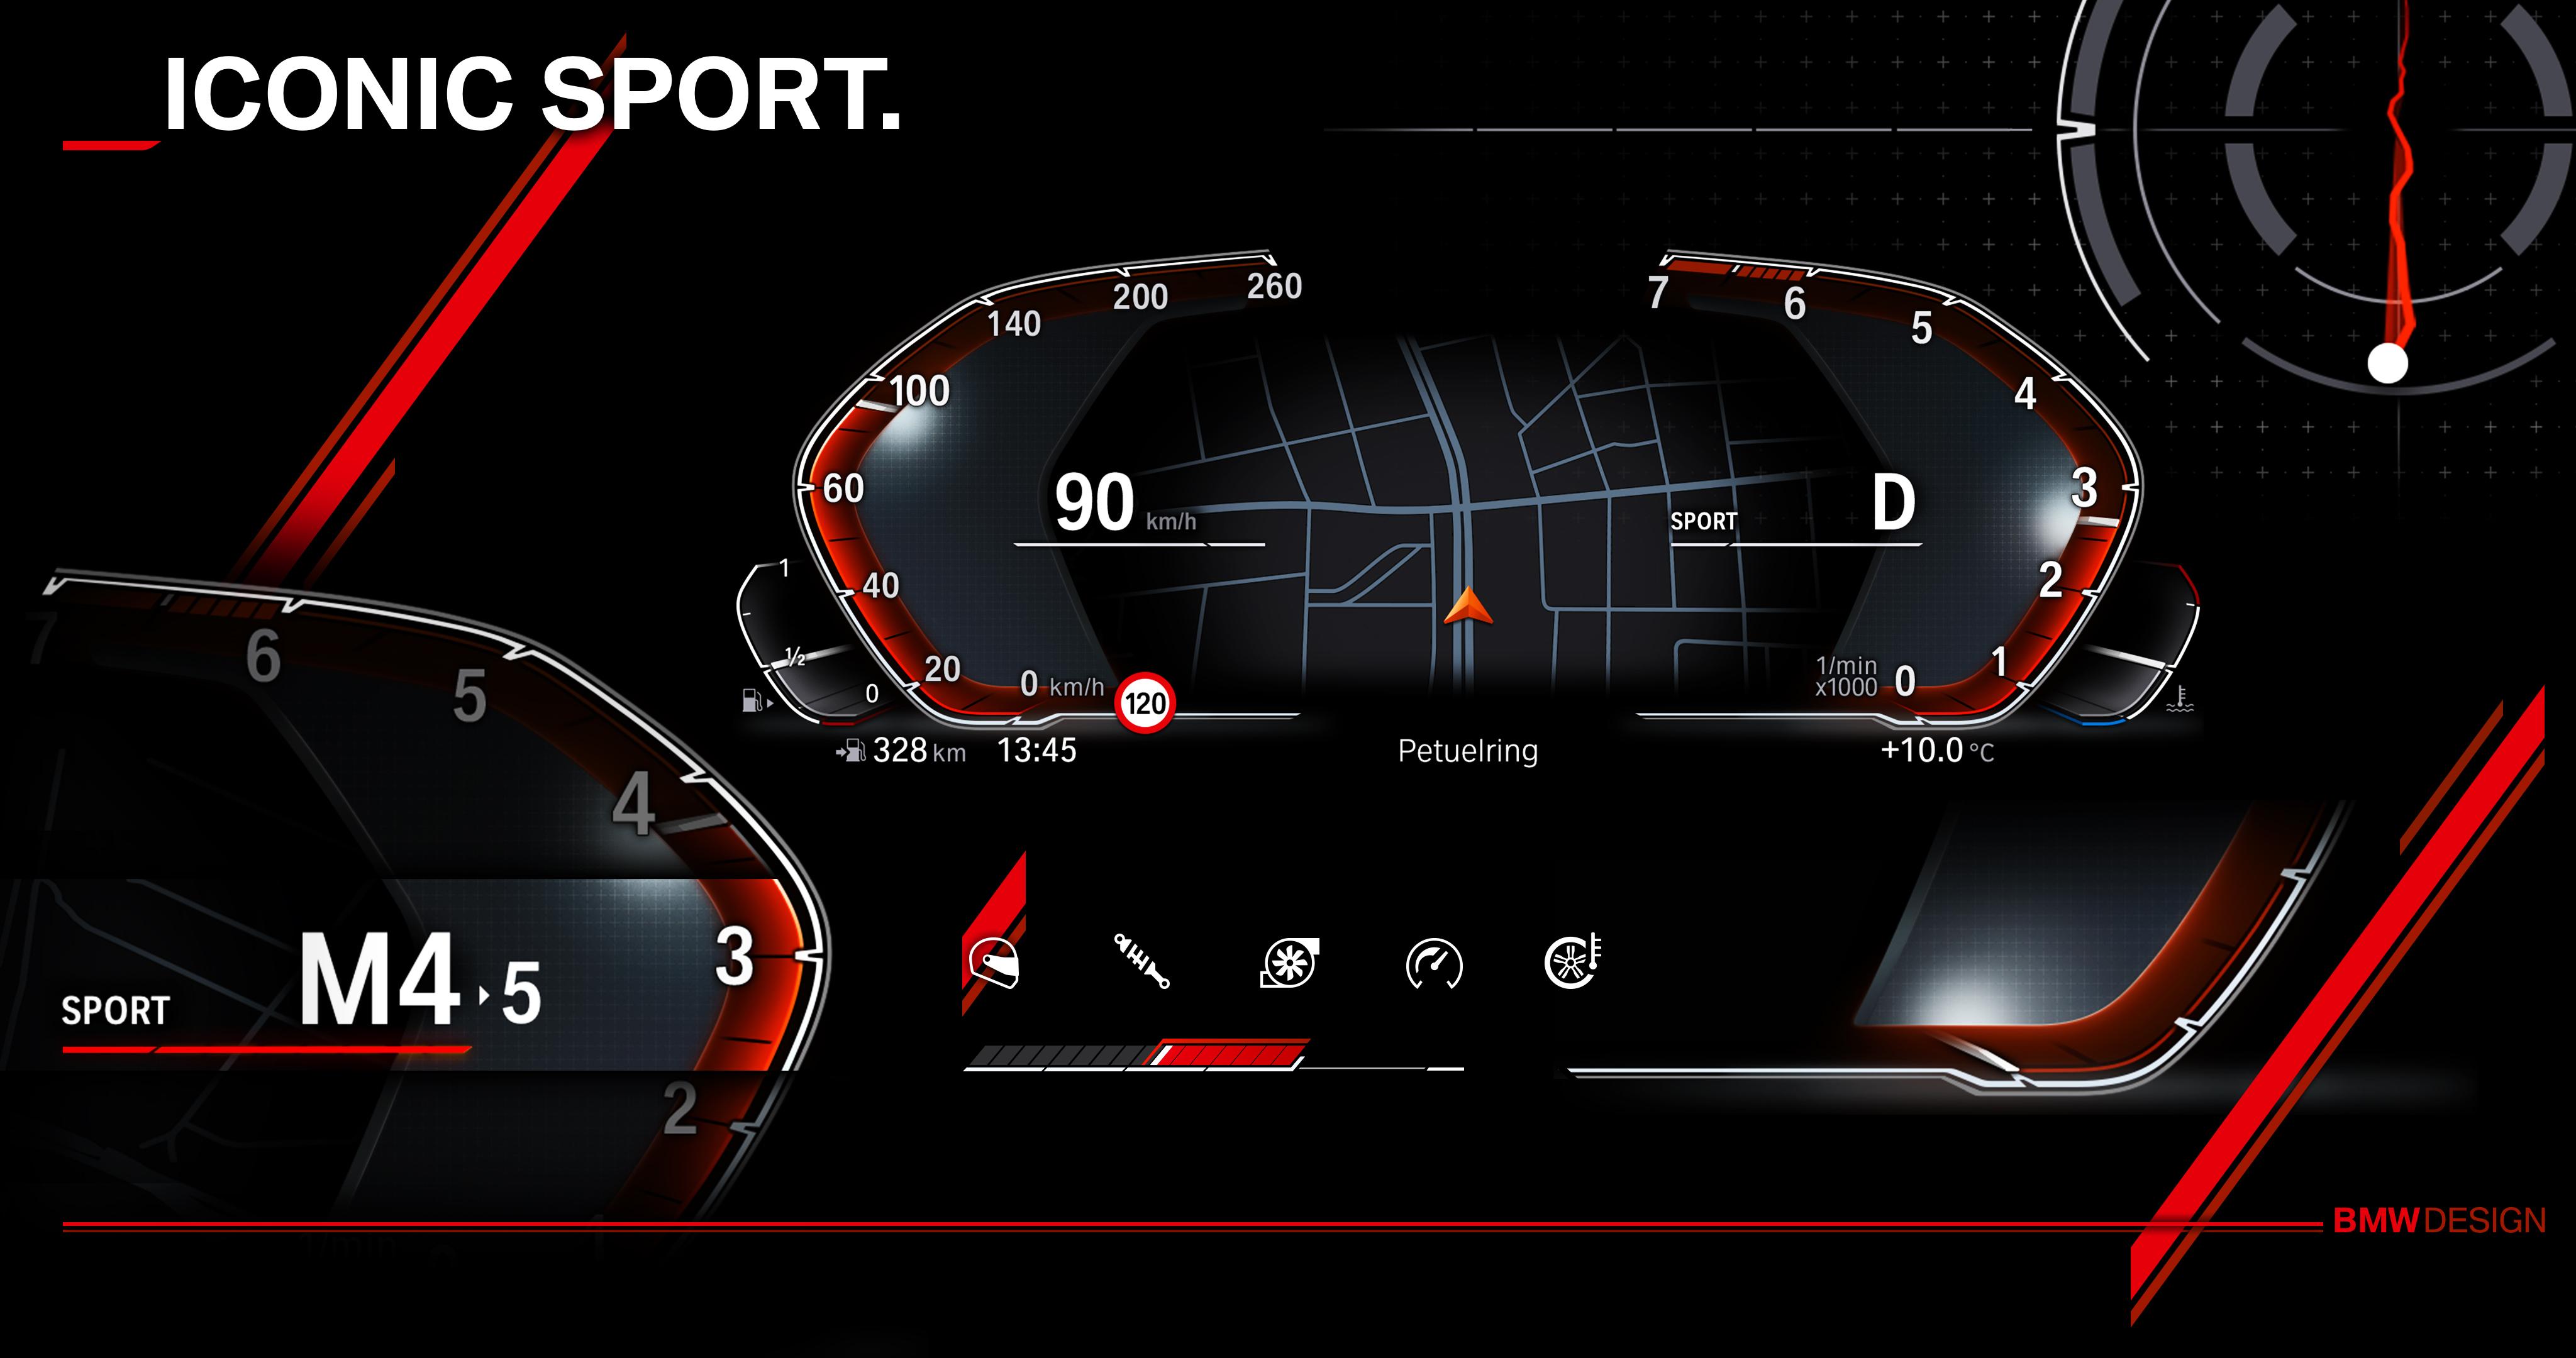 ALPINA B3 S Bi-Turbo試乗しました^^D3 Bi-Turboと乗り比べた結果、Myチョイスは?【D3,B3S試乗レポート後編】